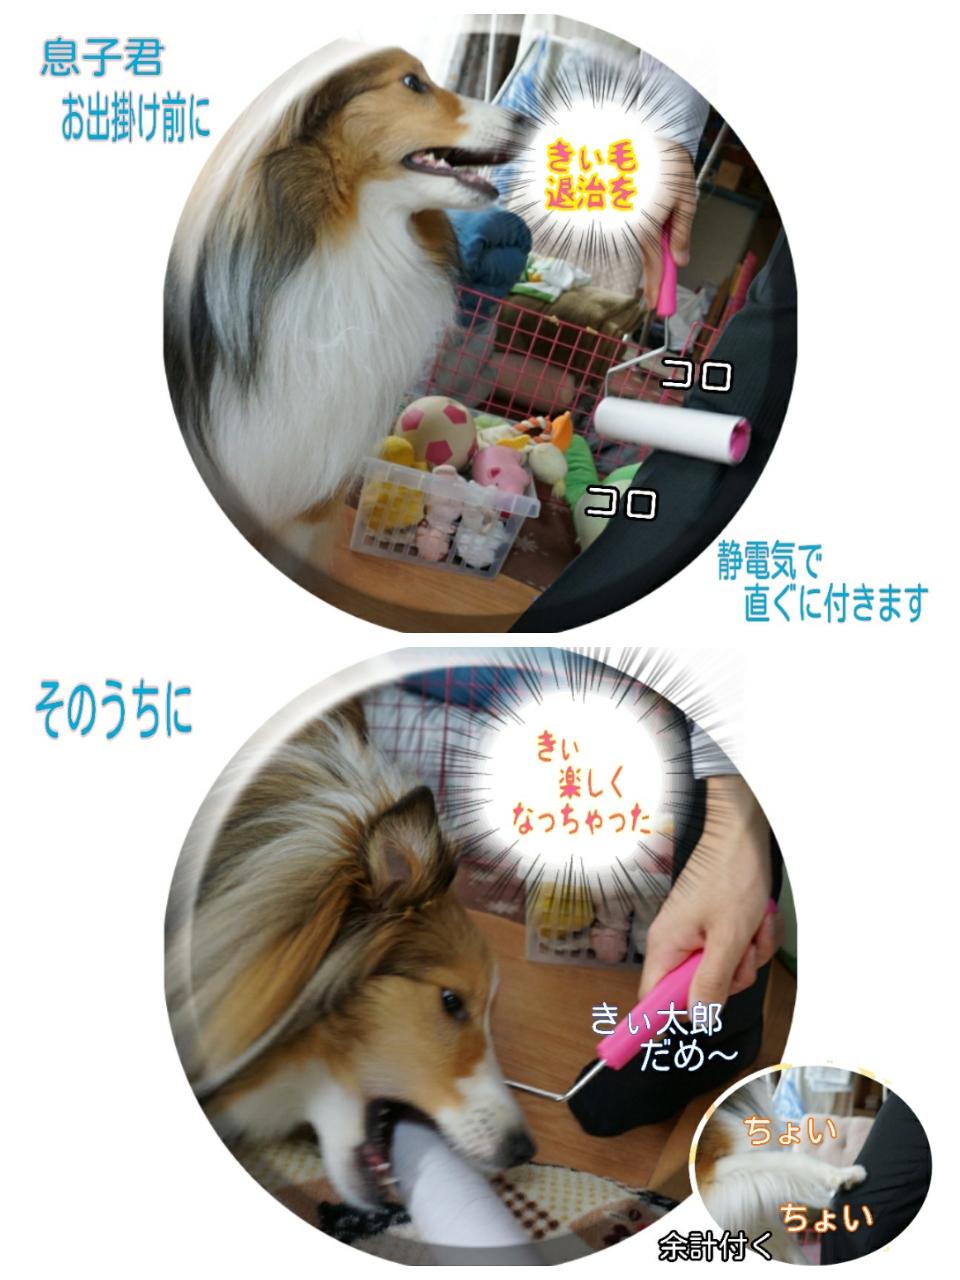 2015-04-01-10-47-15_deco.jpg